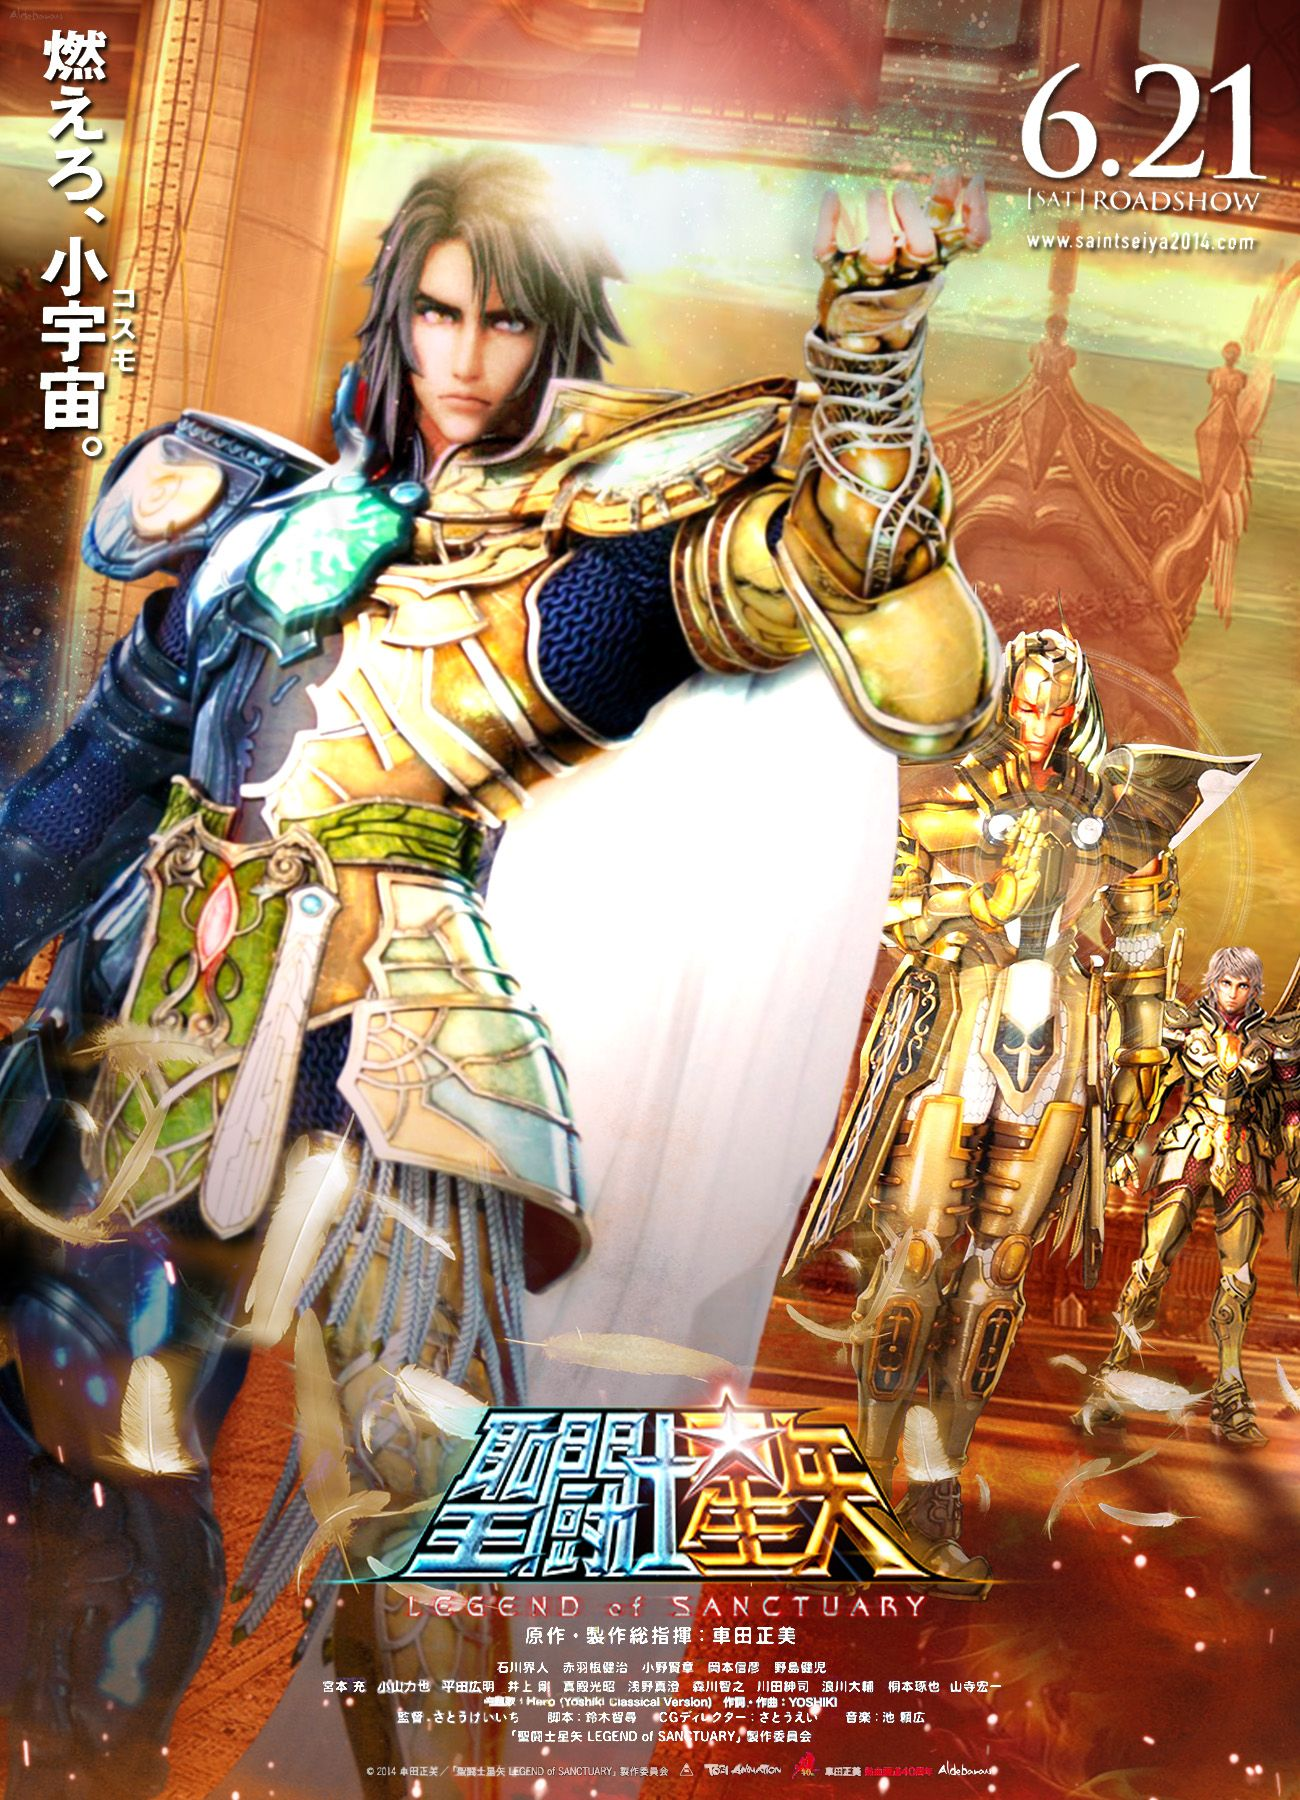 Saint Seiya Legend Of Sanctuary Poster 6 By Sonicx2011 Deviantart